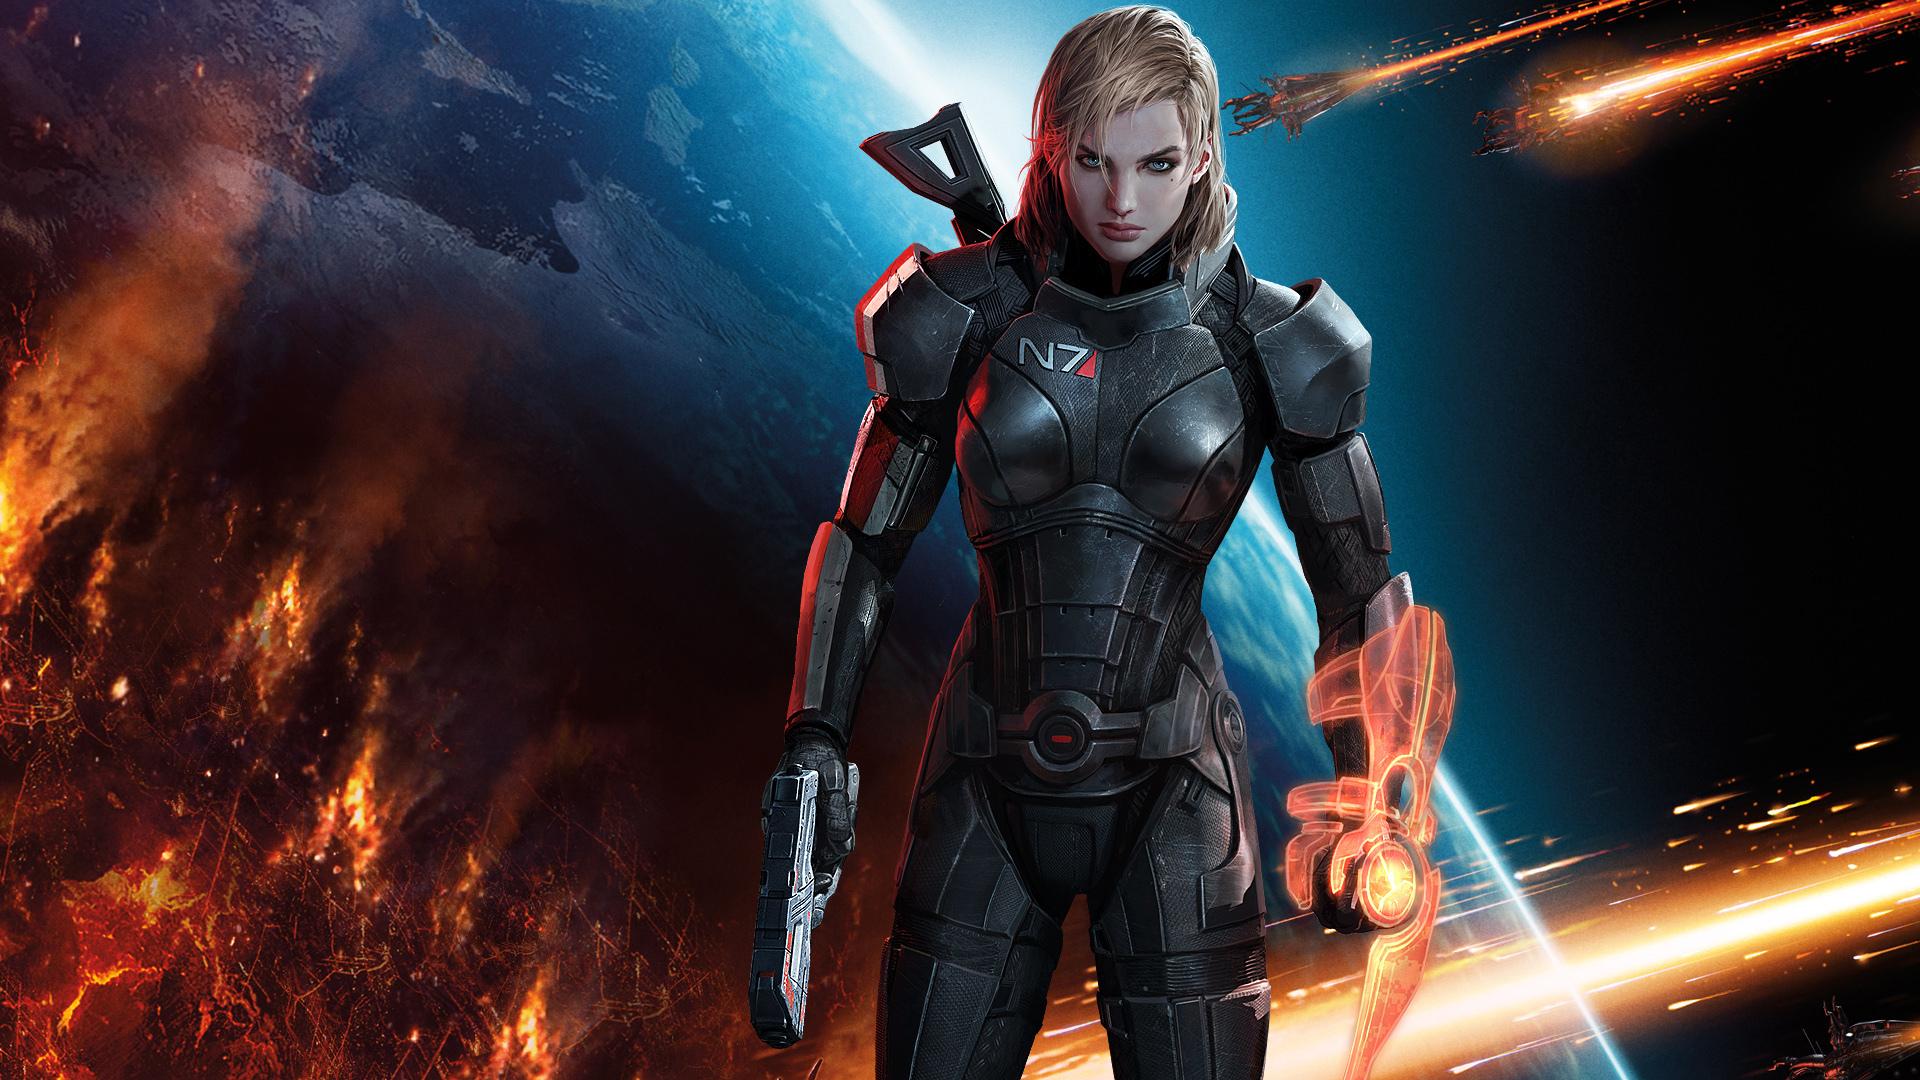 Mass Effect 3 HD Wallpaper | Background Image | 1920x1080 ...